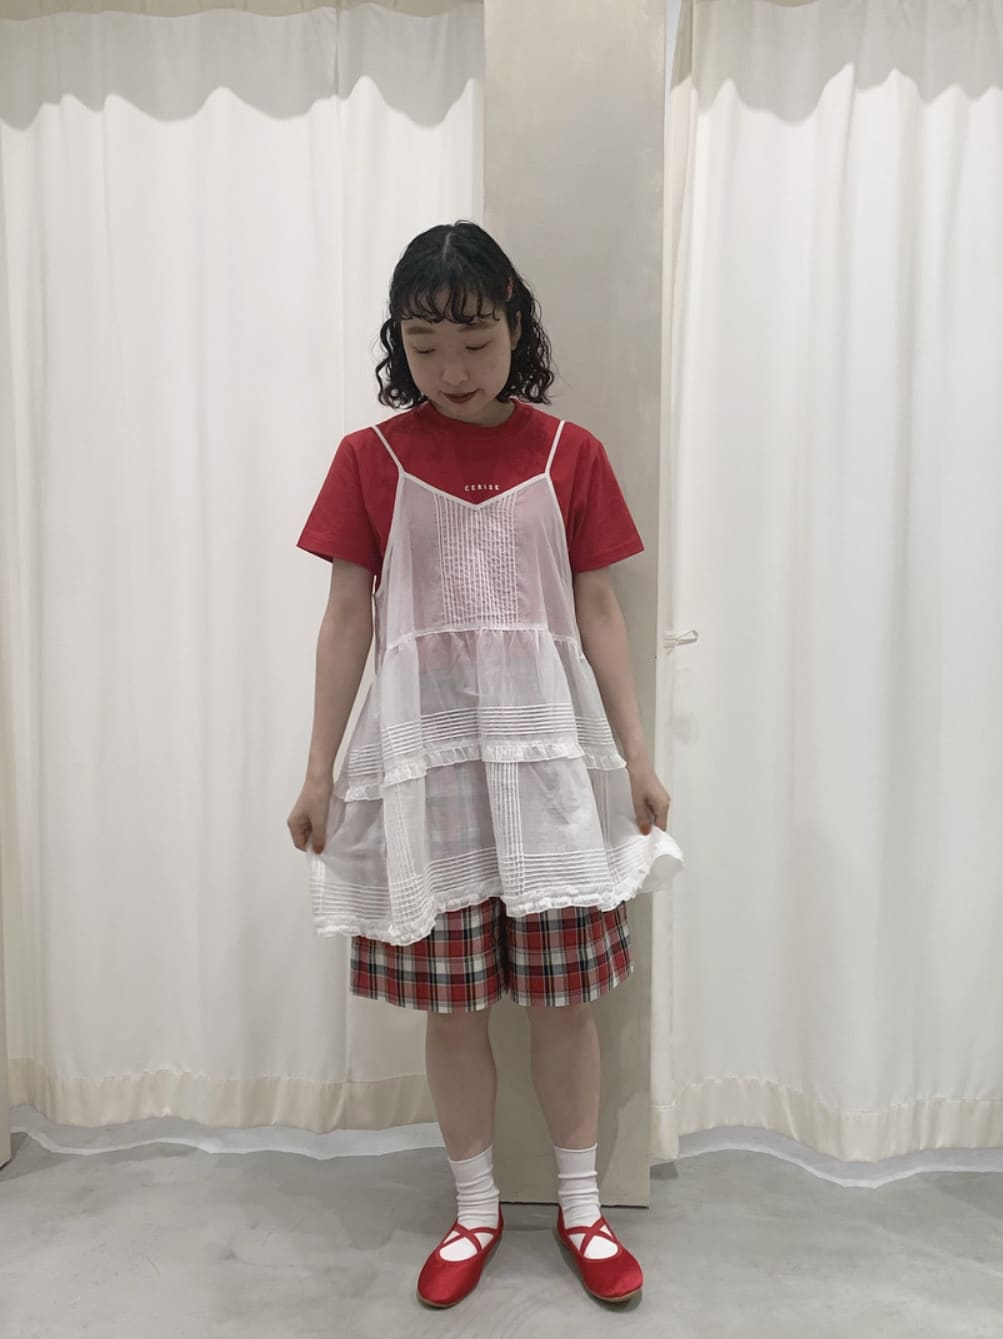 - CHILD WOMAN CHILD WOMAN , PAR ICI ルミネ横浜 身長:157cm 2021.08.23